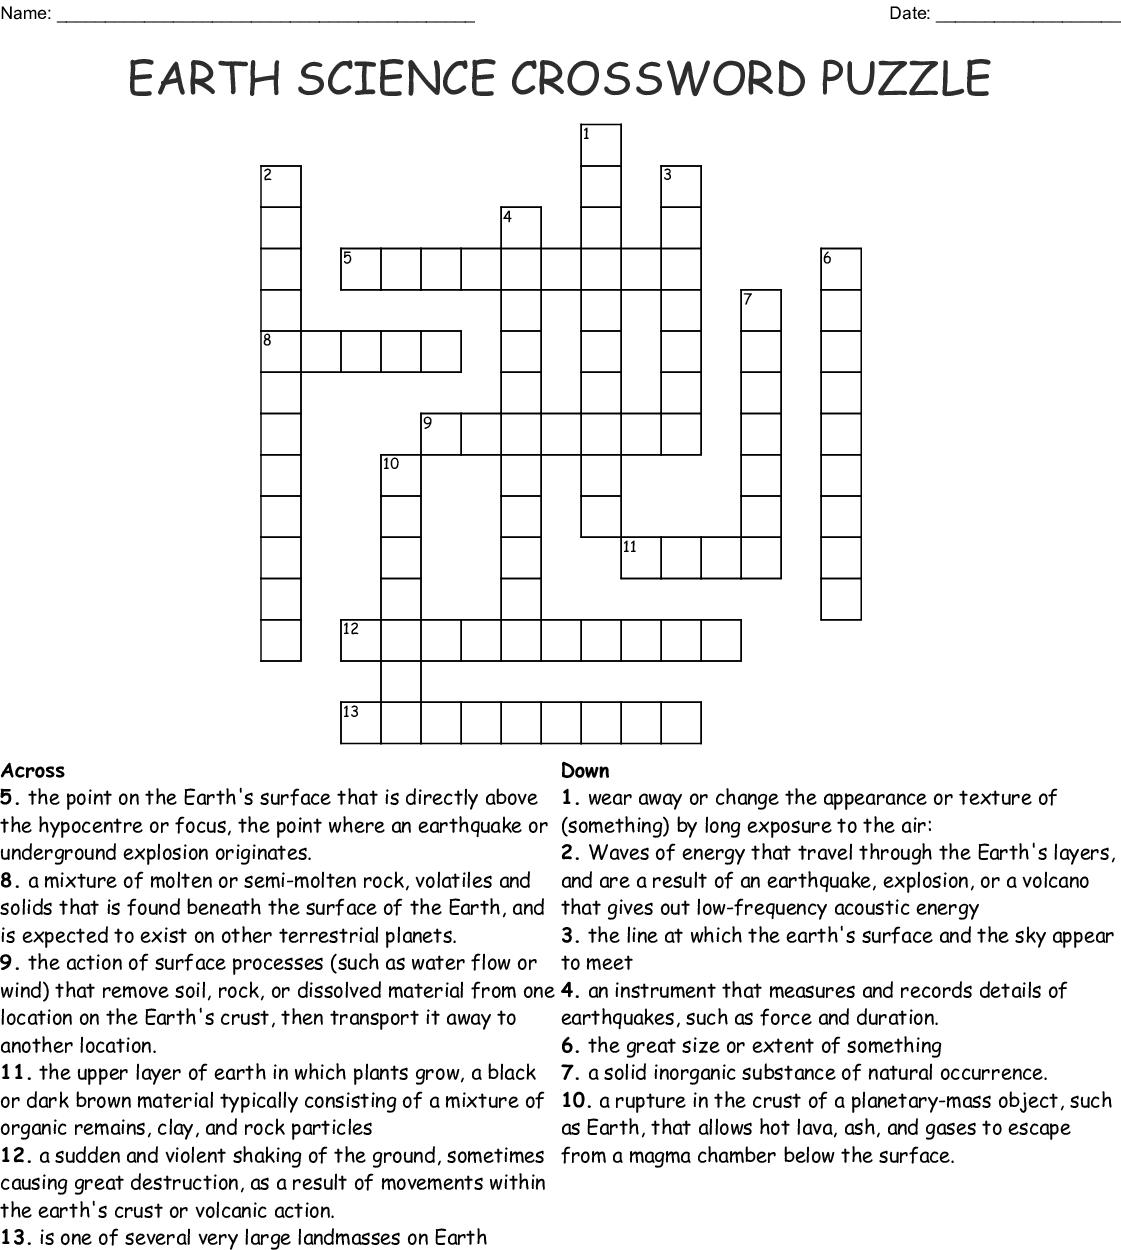 Free Printable Science Crossword Puzzles